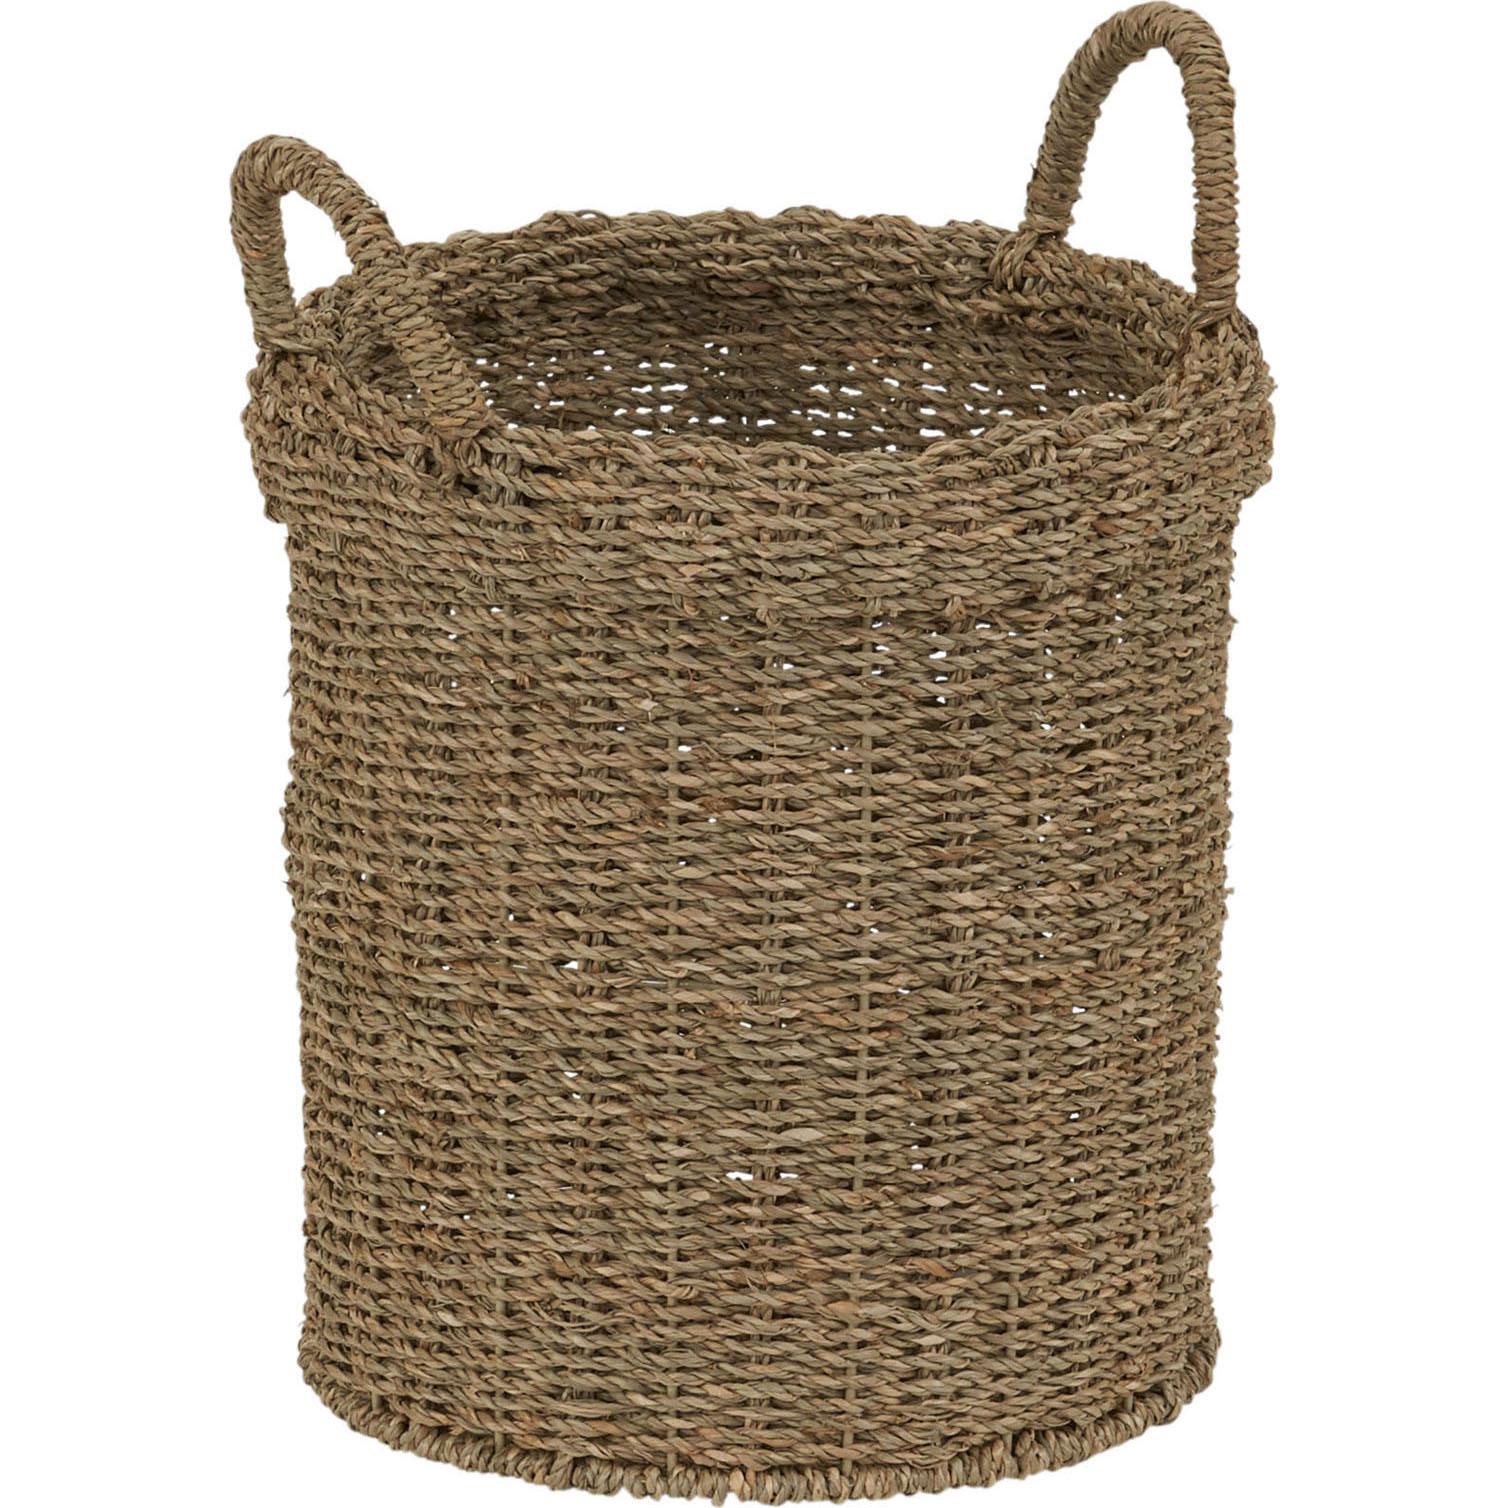 Household Essentials Round Seagrass Basket with 2 Handles